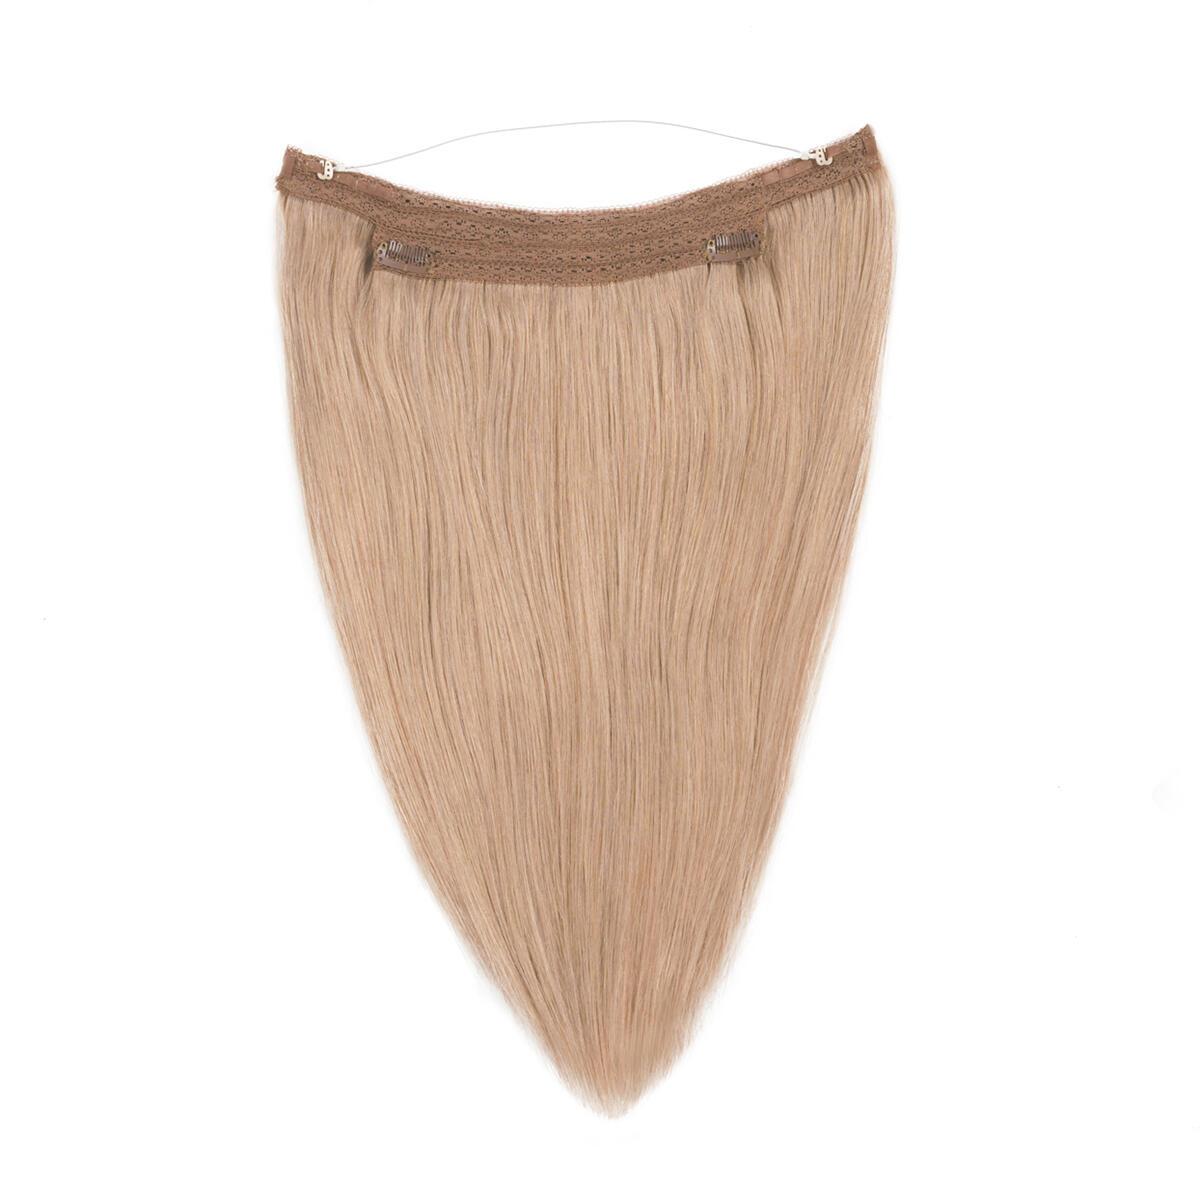 Hairband Original 7.5 Dark Blonde 45 cm